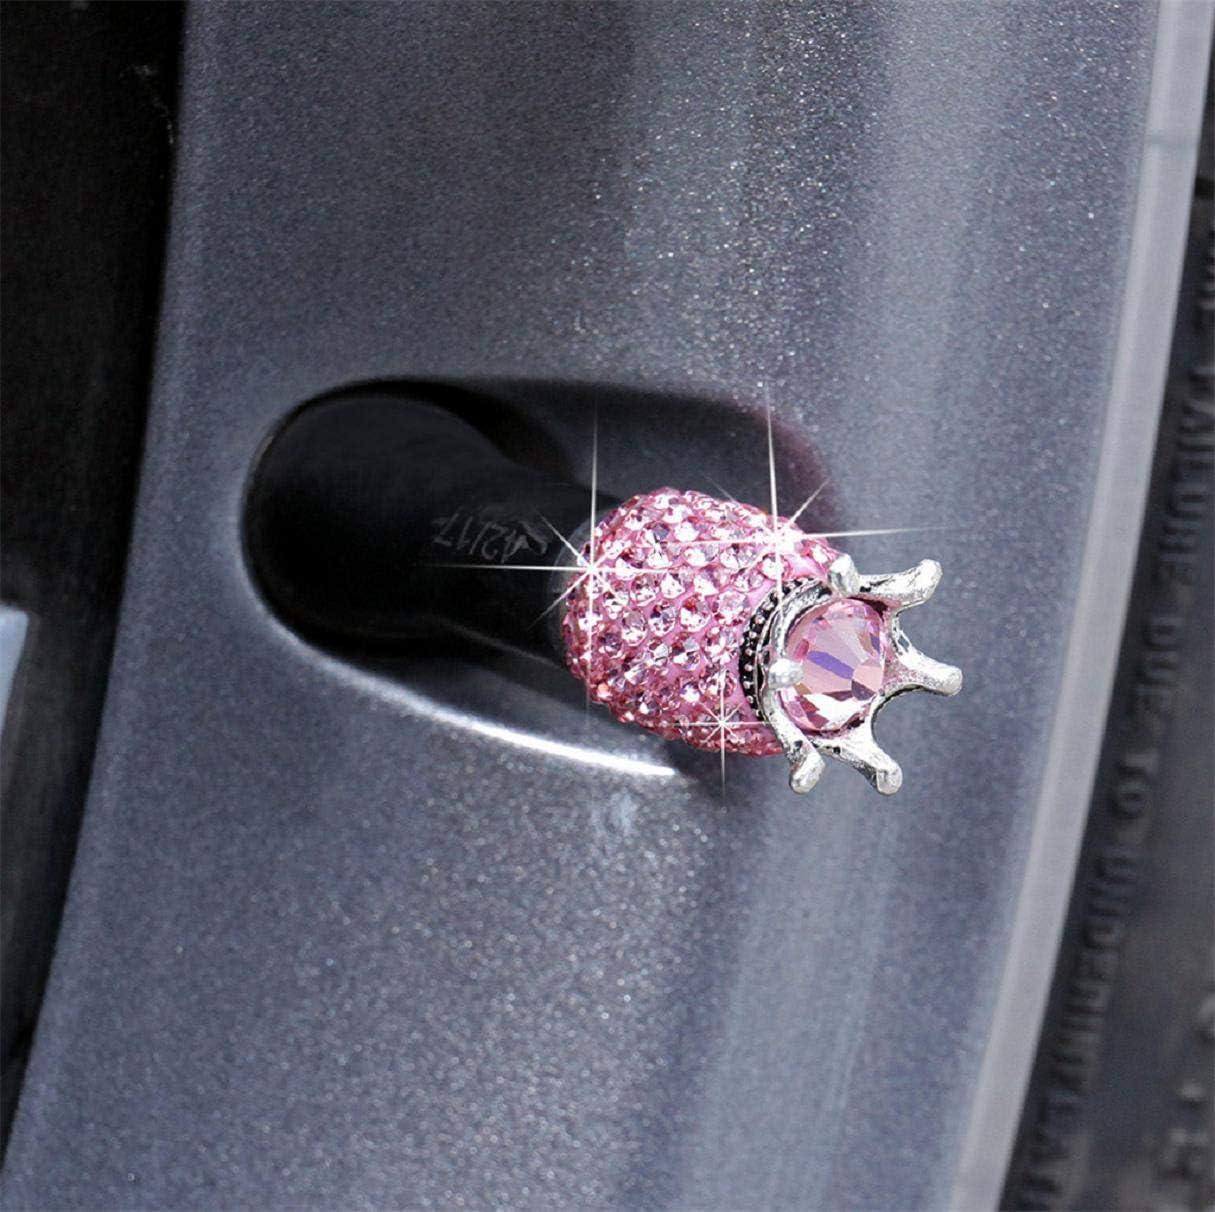 Boddenly 4 Pack Valve Stem Caps Crystal Rhinestone Universal Tire Valve Dust Caps Bling Car Accessories,Car Tire Valve Stem Caps Round Style Air Covers Crystal Universal Tire Caps for Car Wheels